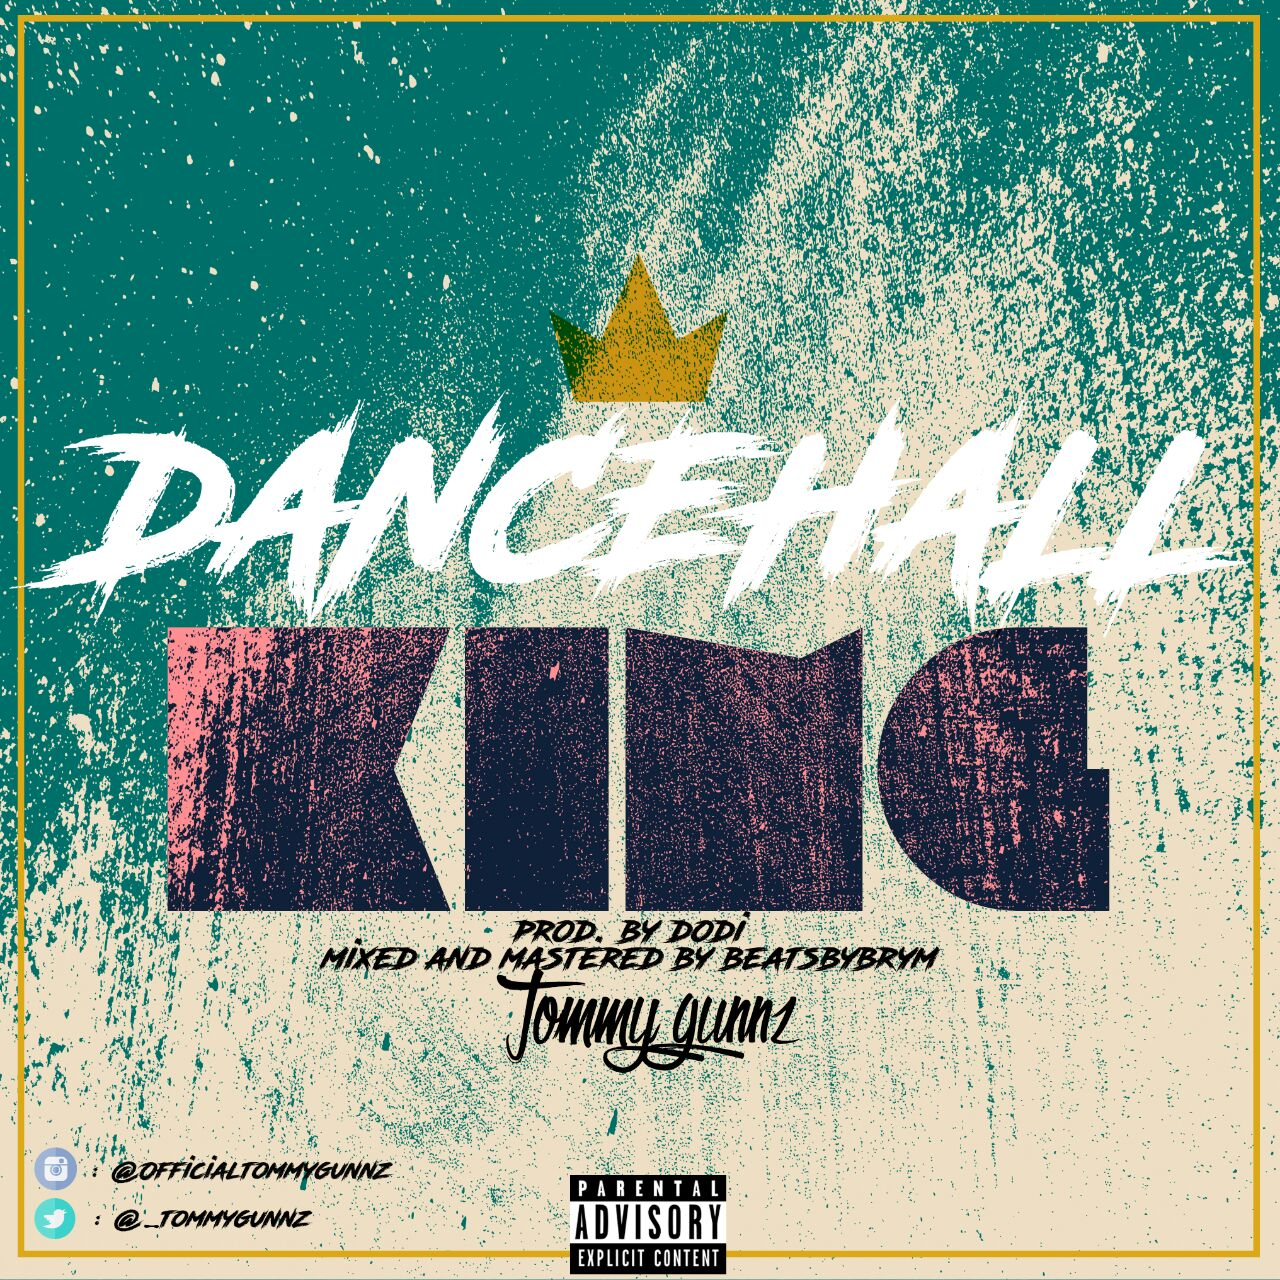 TommyGunnz – Dancehall king